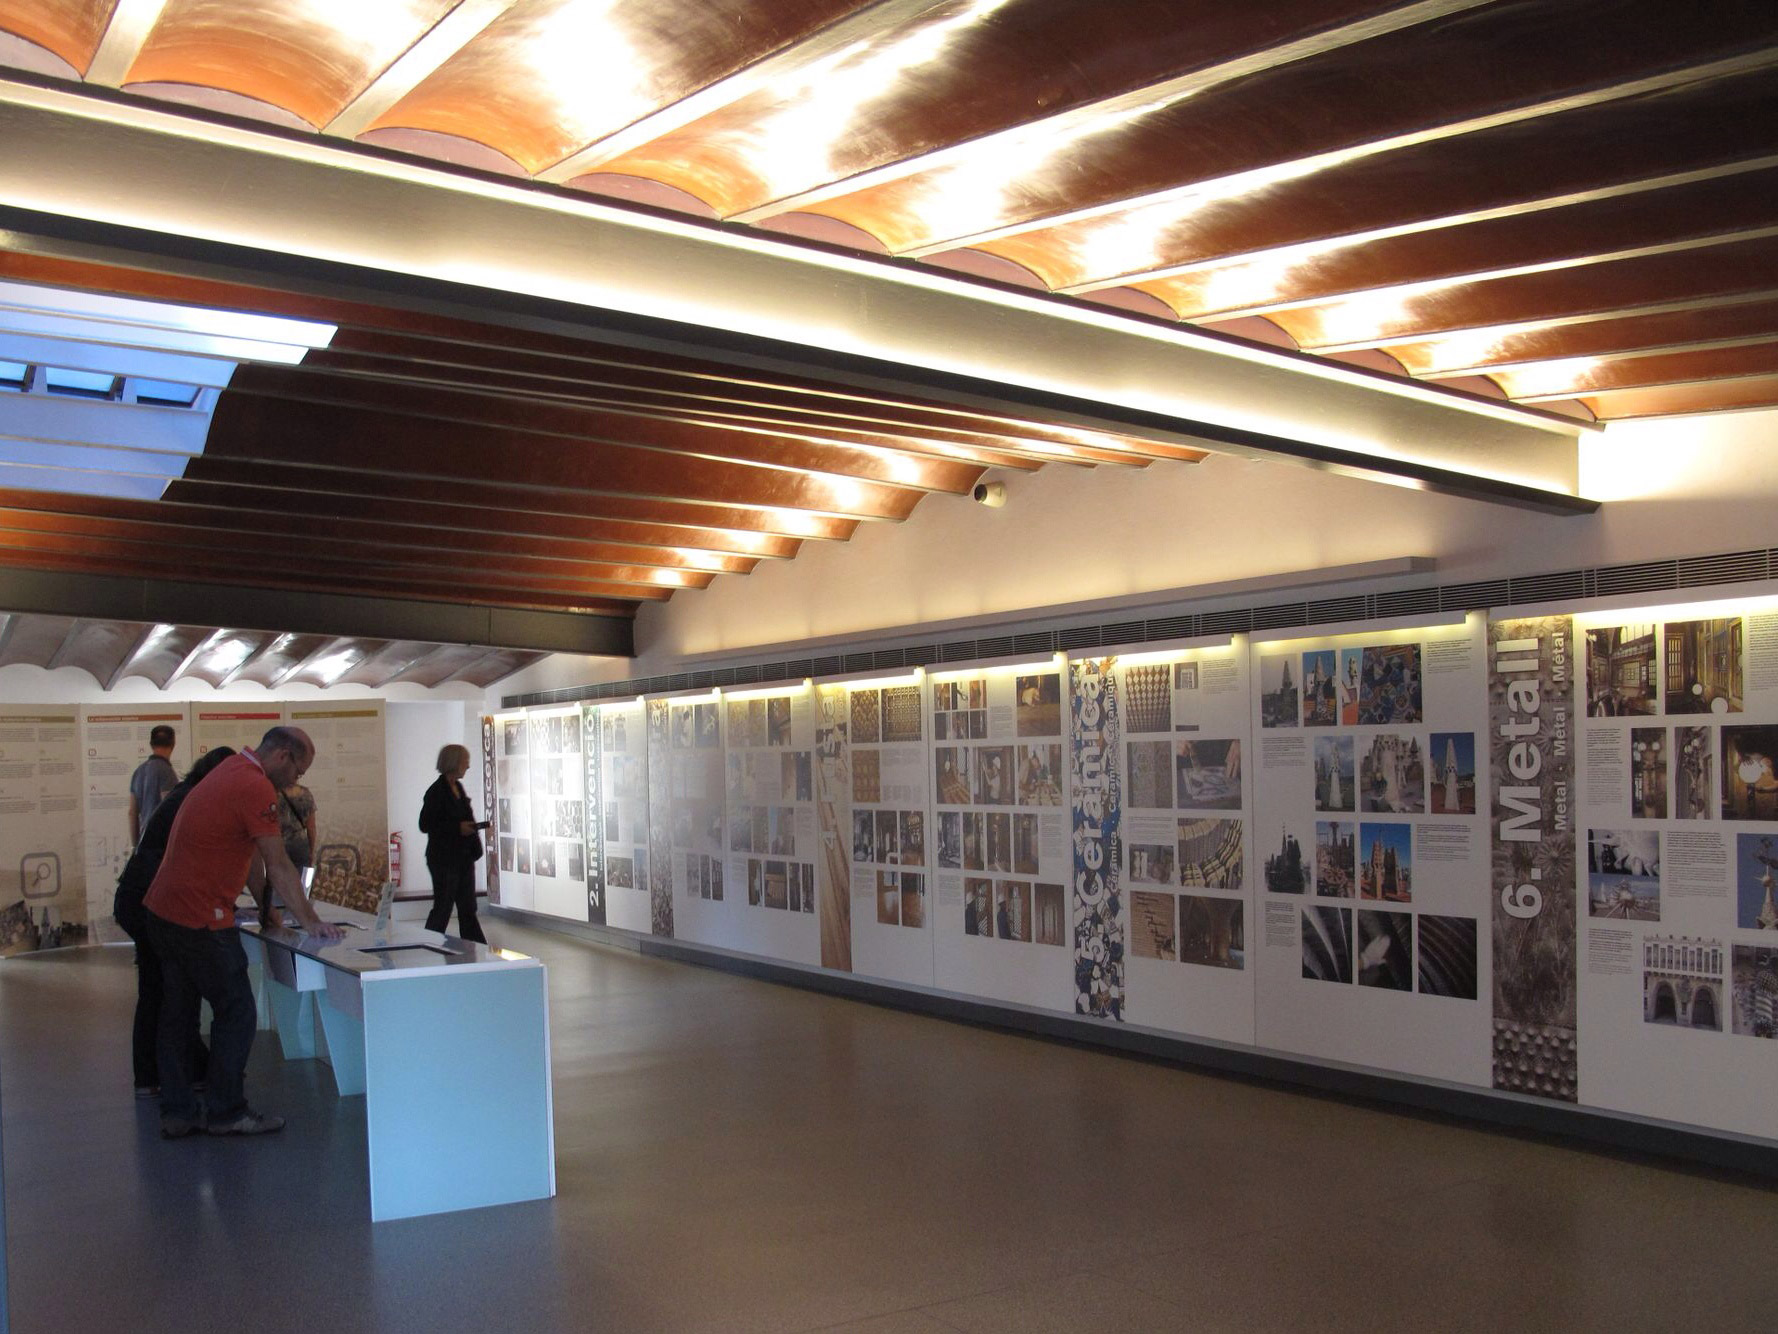 Palau güell_exposicion restauracion_antonio gonzalez _BbCR